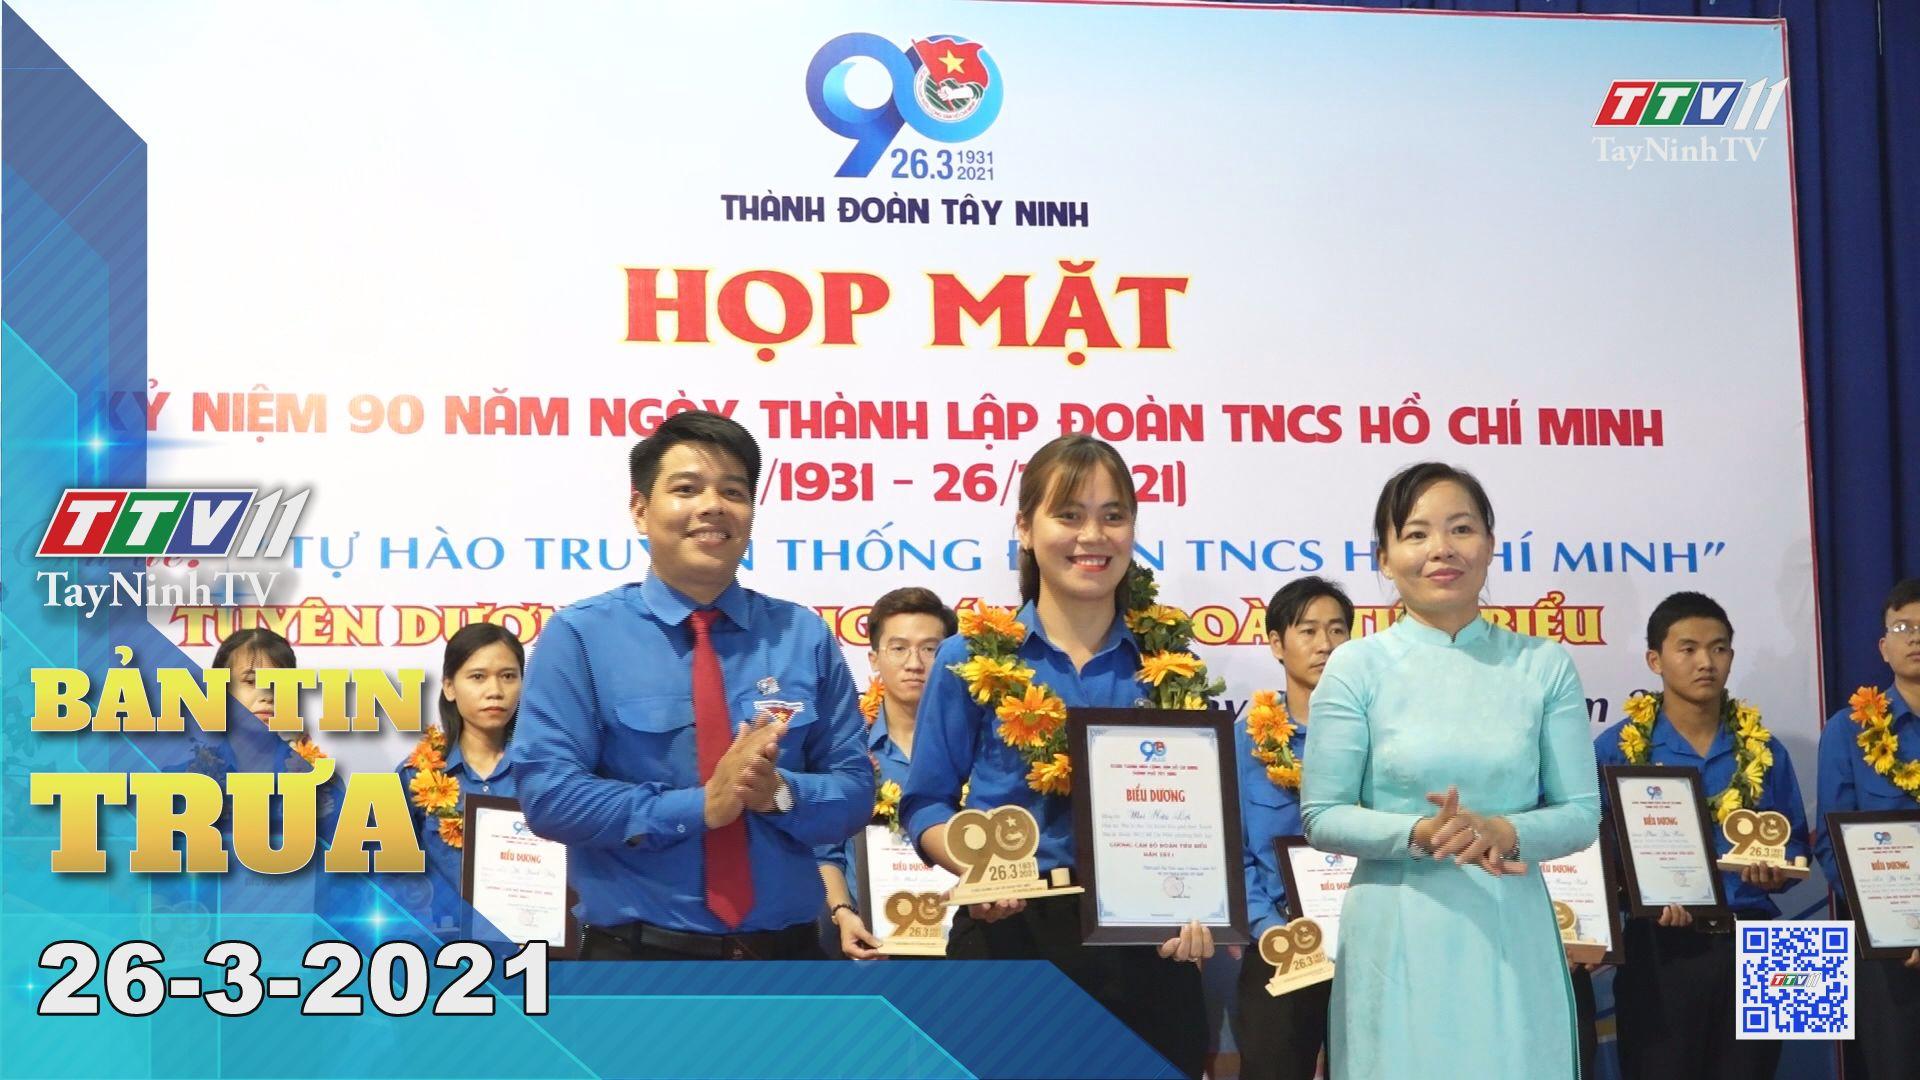 Bản tin trưa 26-3-2021 | Tin tức hôm nay | TayNinhTV